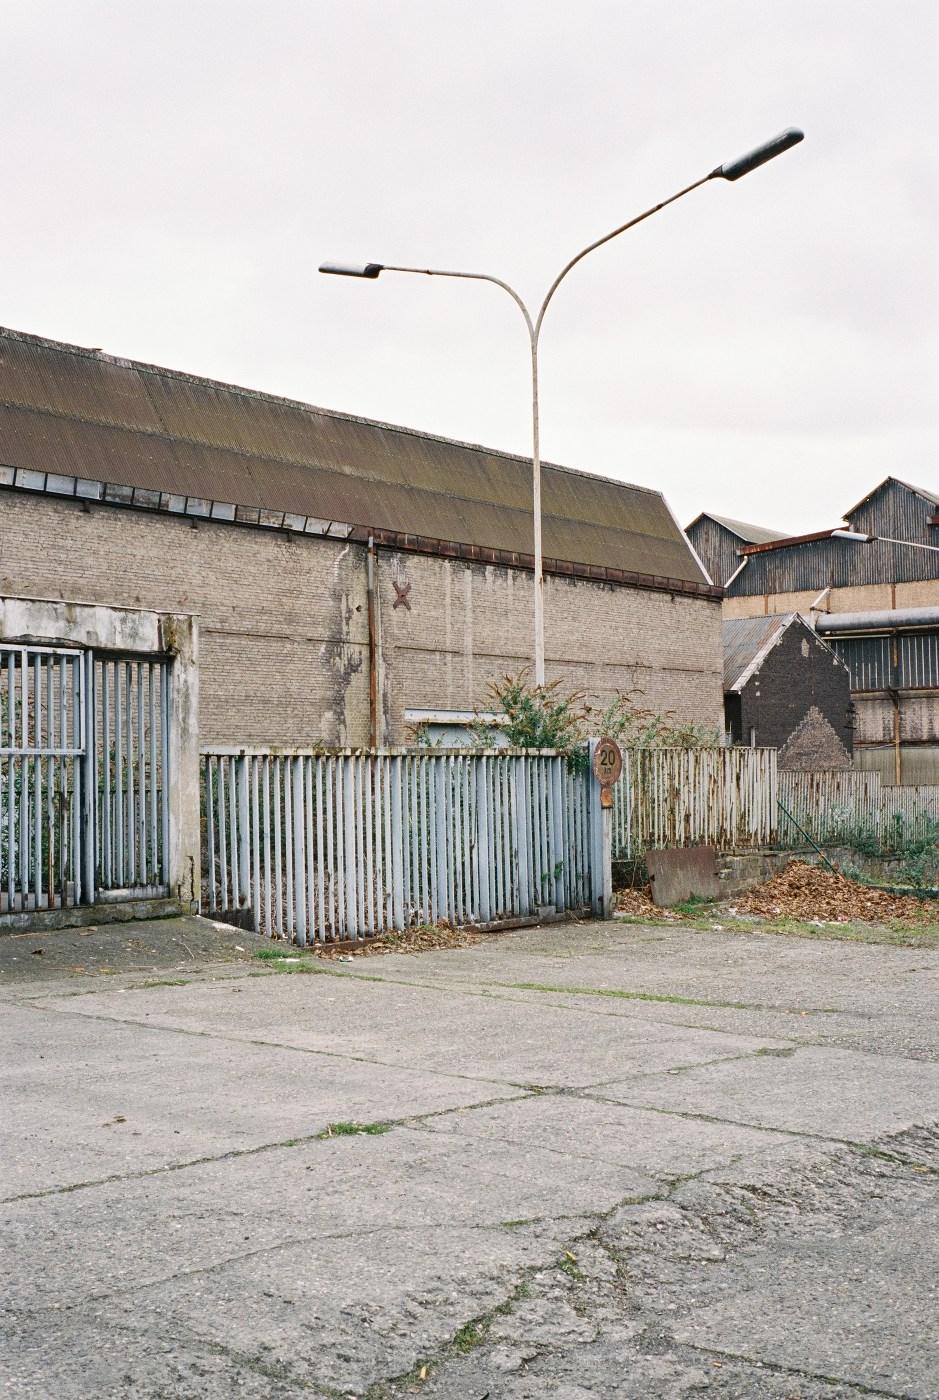 000017JoergBergs-KodakPortra400-MeinFilmLab-M7-35